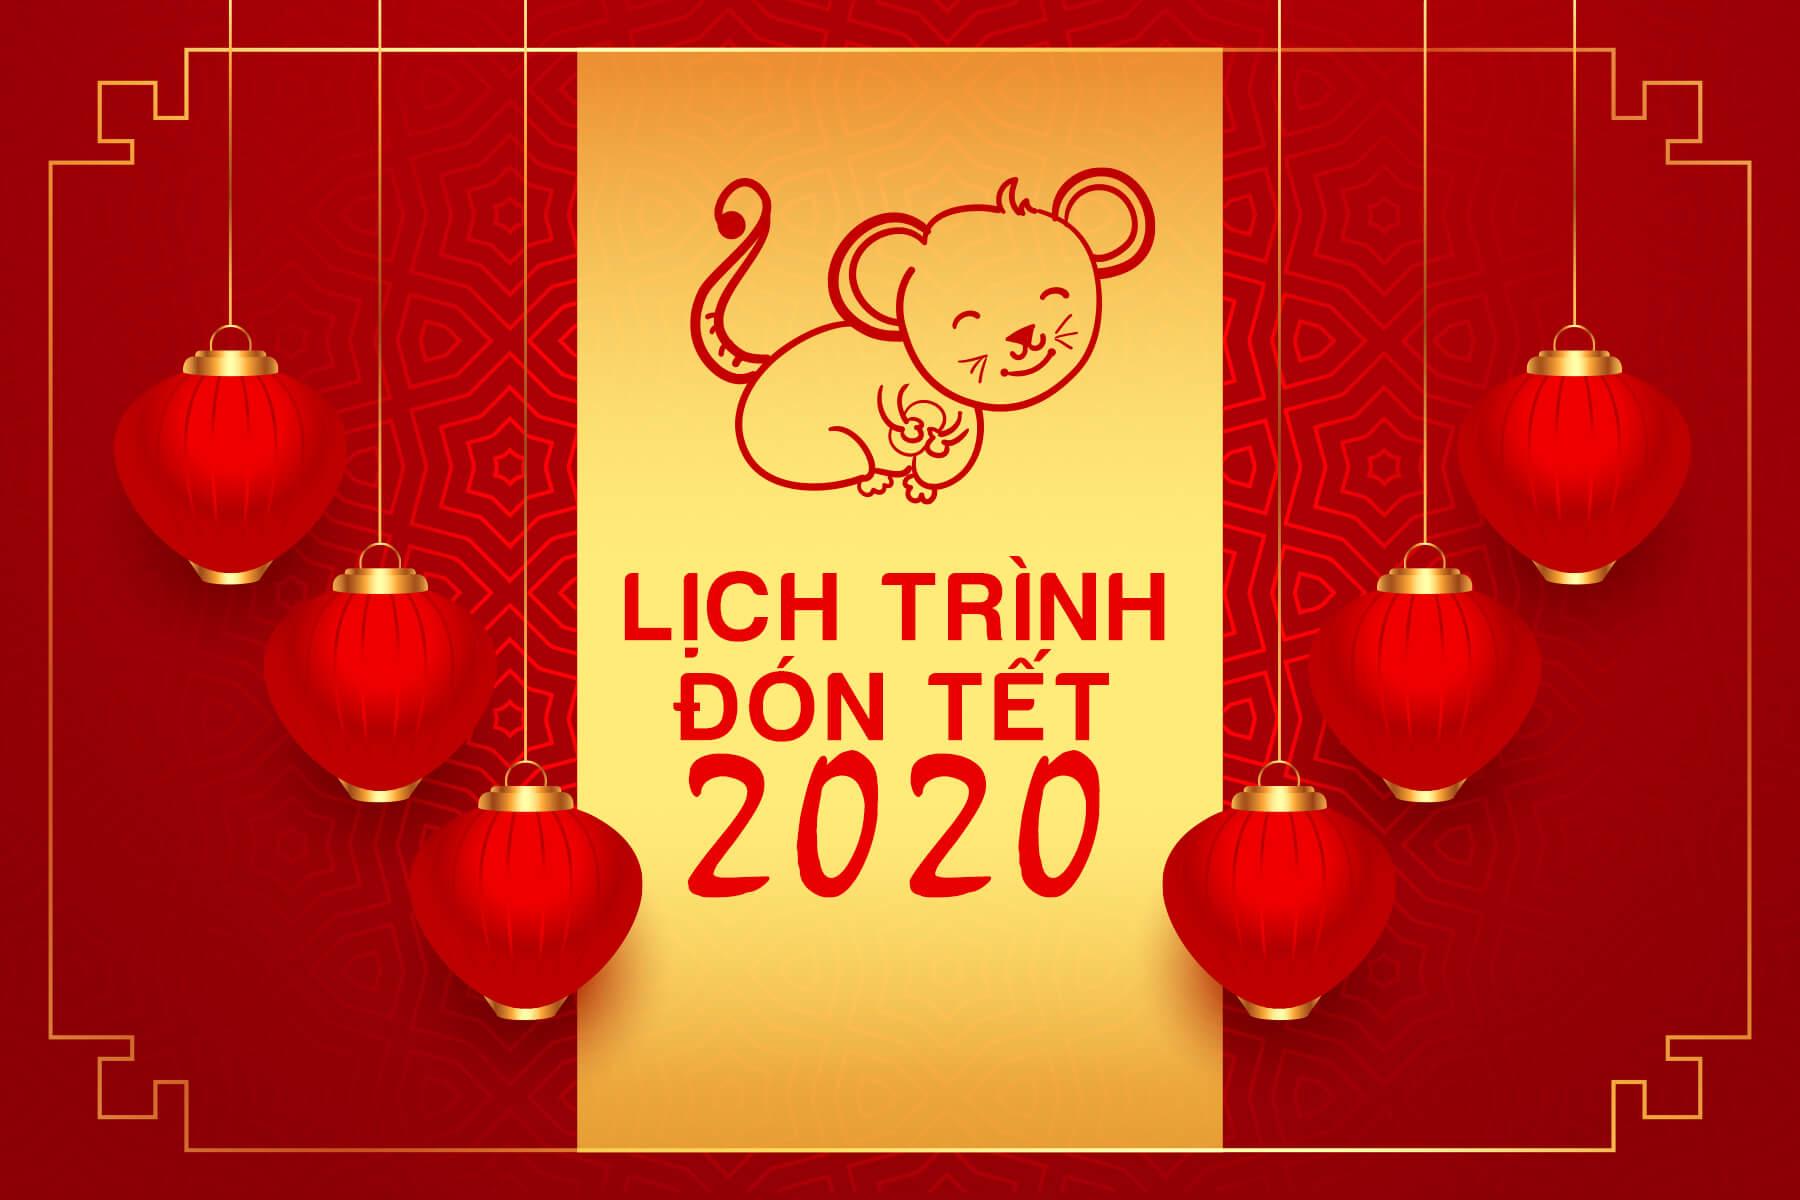 lich-trinh-don-tet-2020-anh